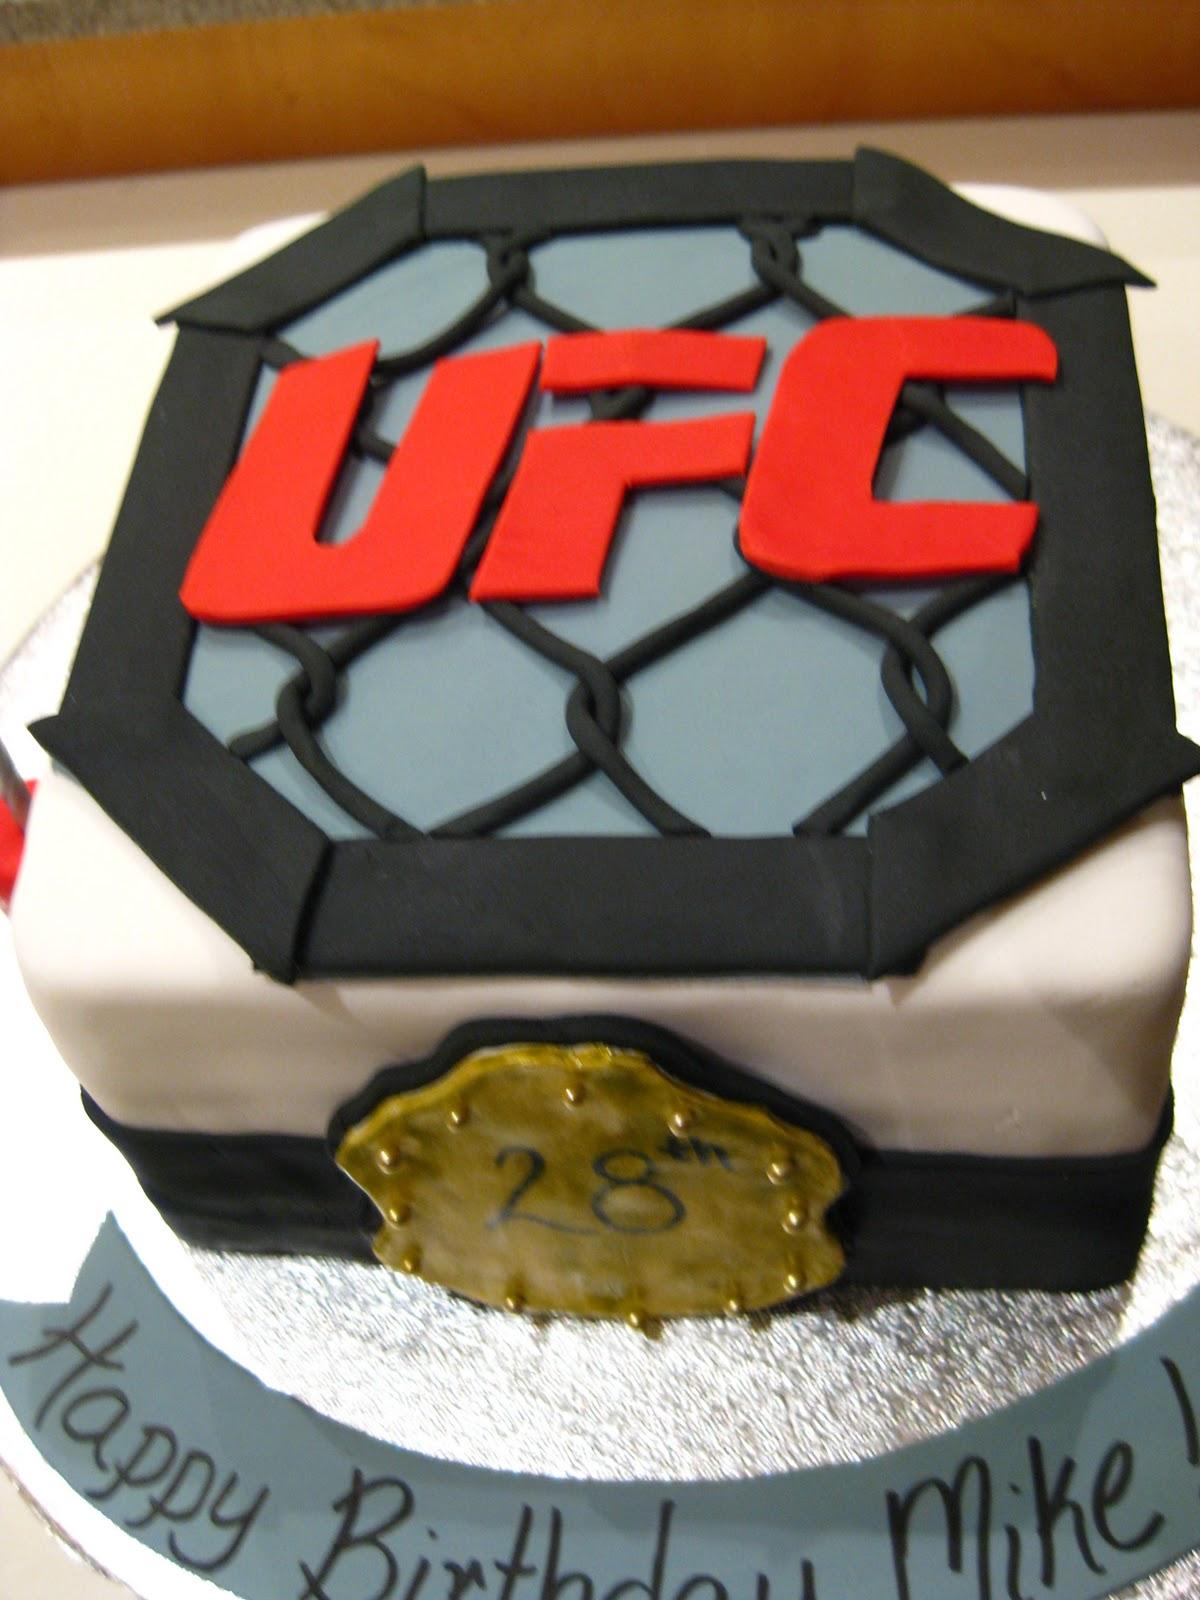 Life S Sweet Ufc Birthday Cake